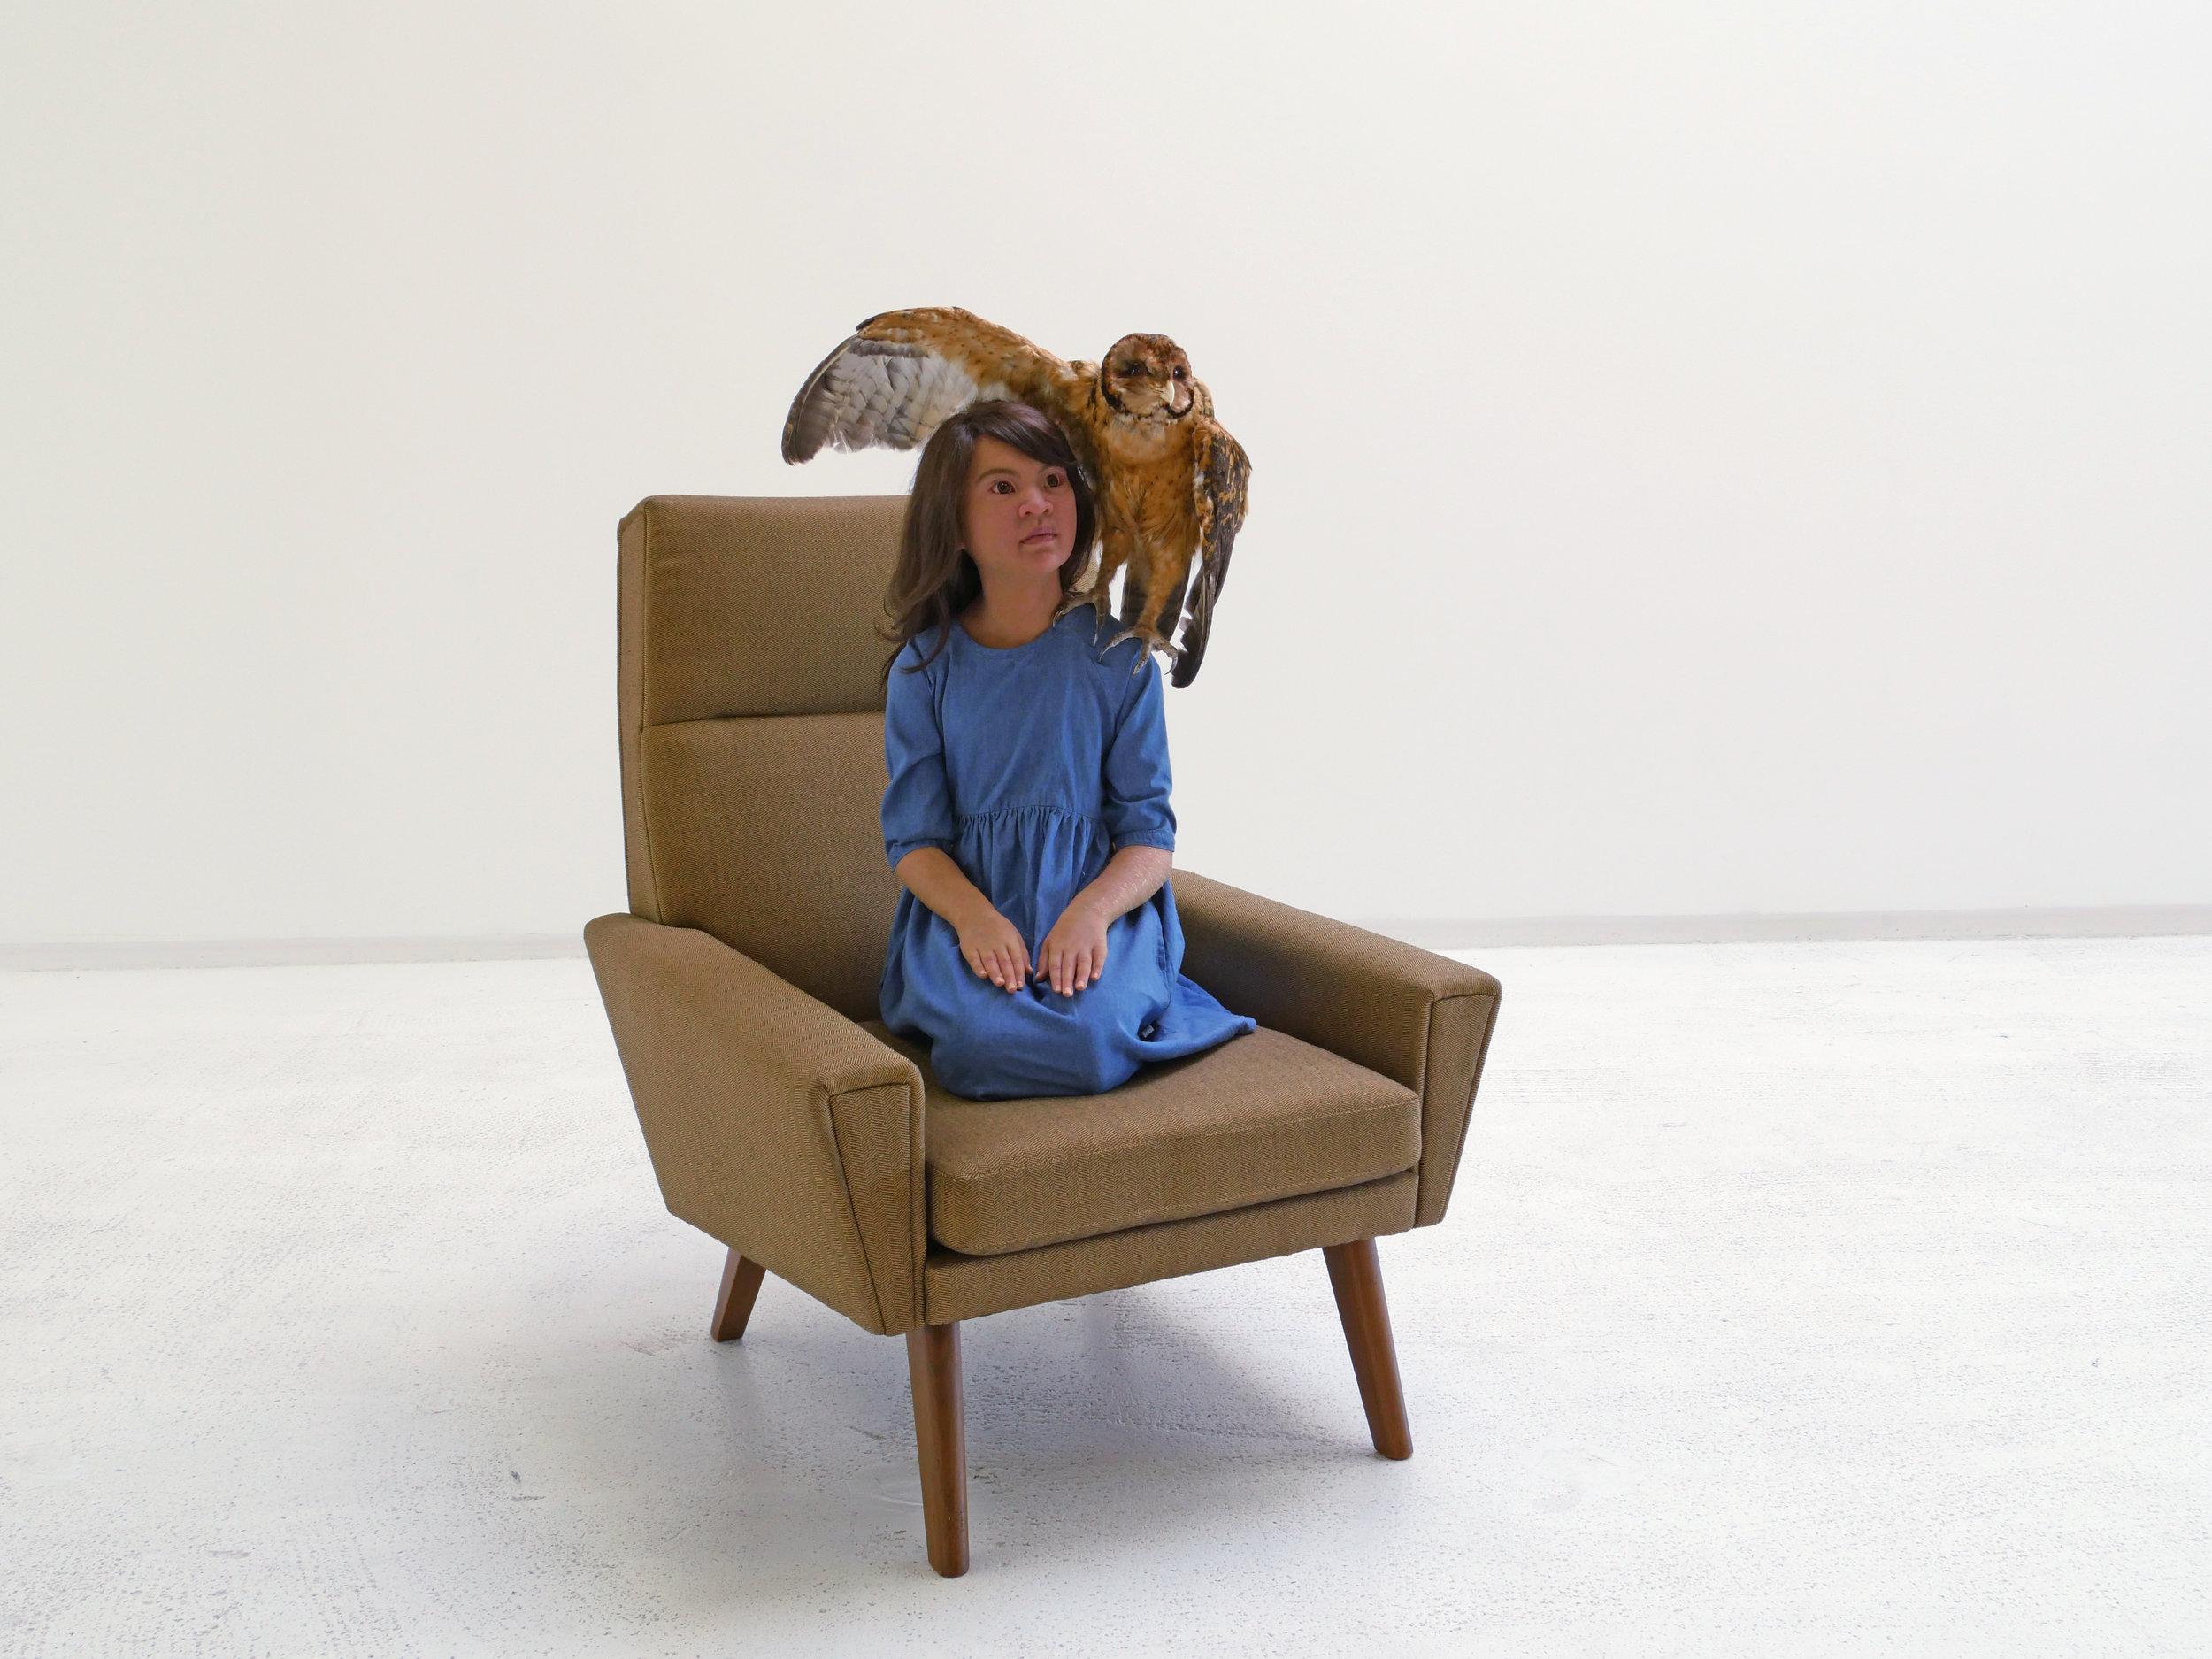 Patricia Piccinini, Internatural at Hosfelt Gallery, San Francisco USA, 2018